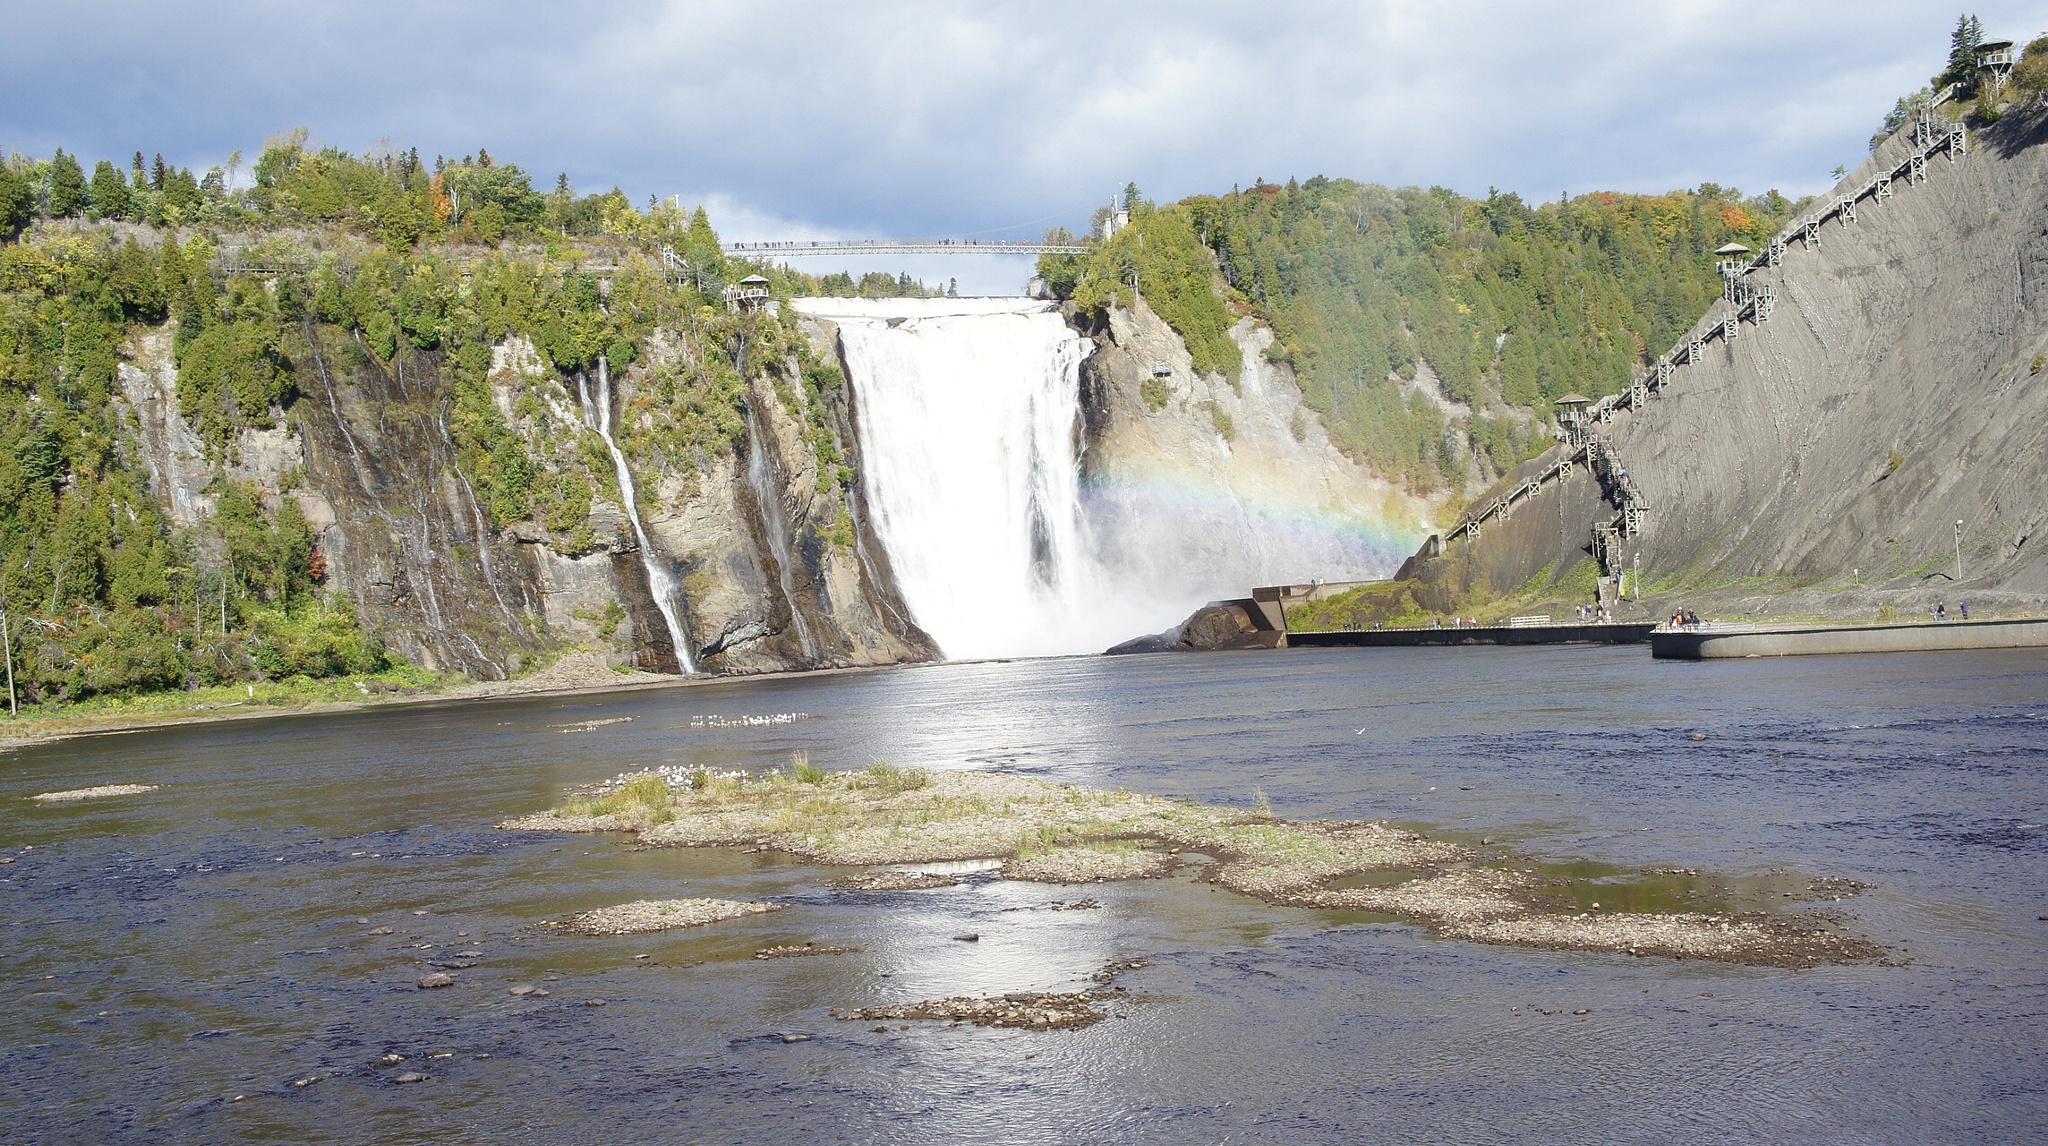 Waterfall in canada  by hakkie